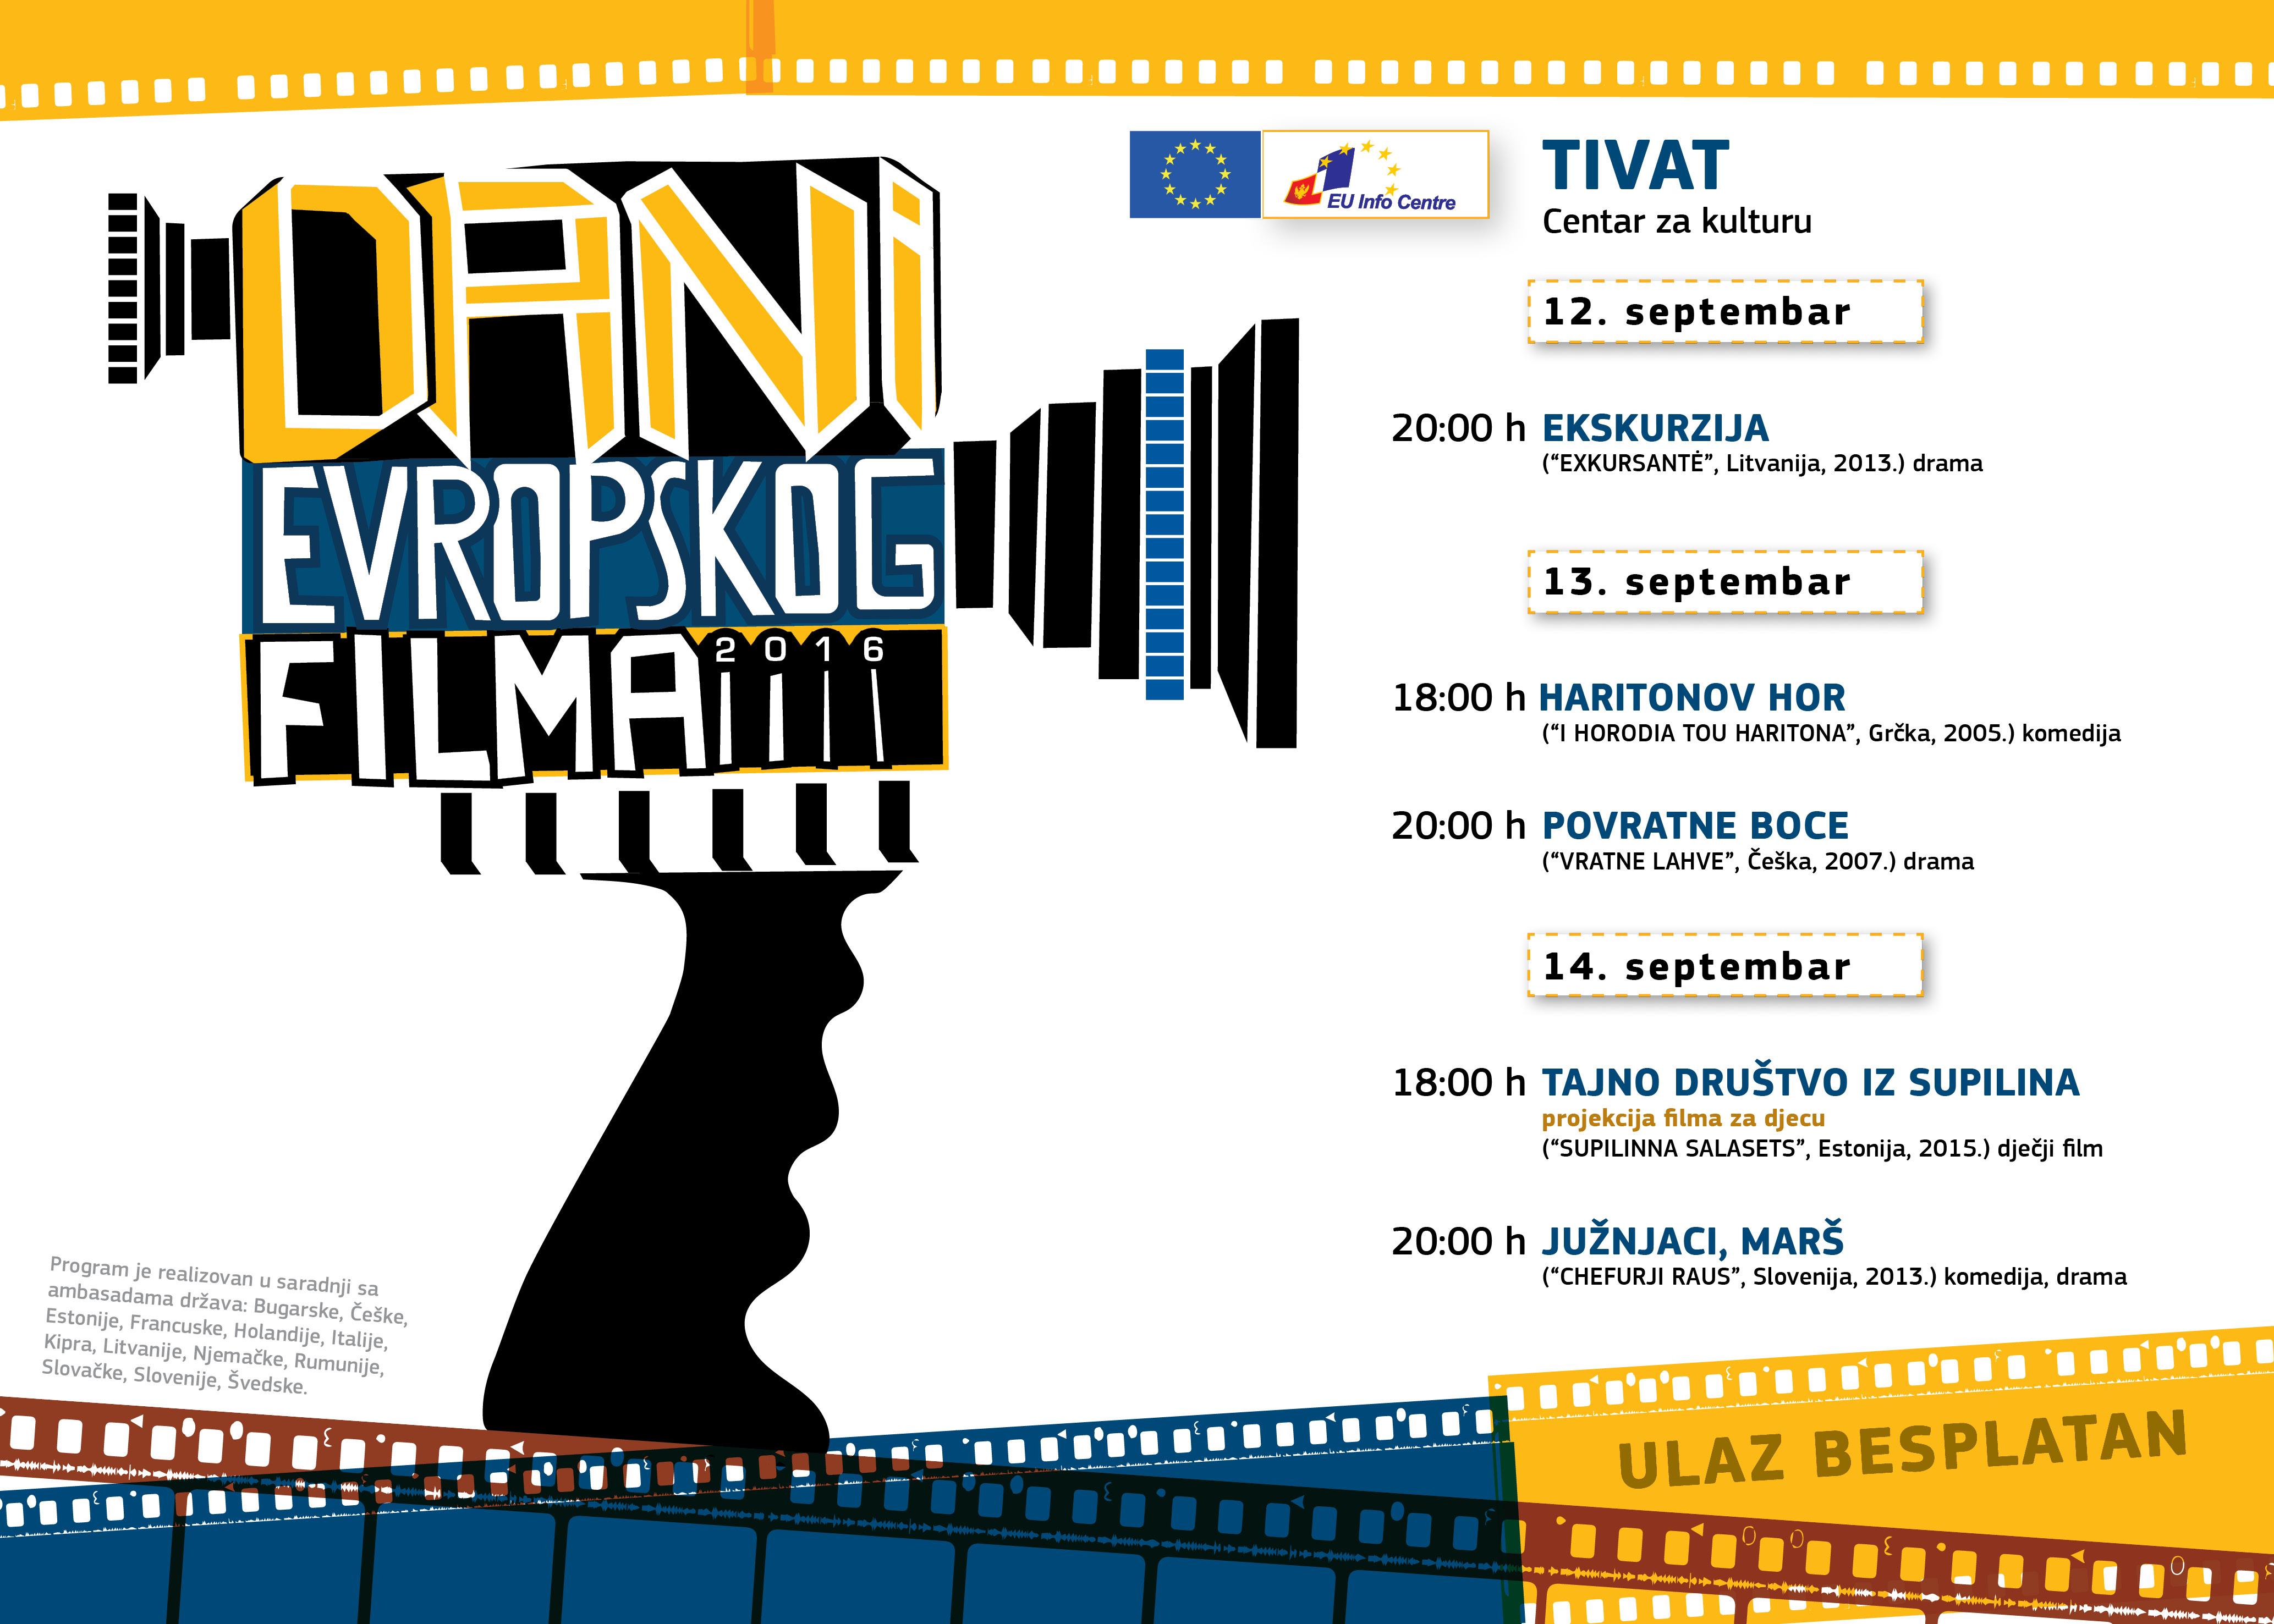 Dani evropskog filma - Tivat za web plakat